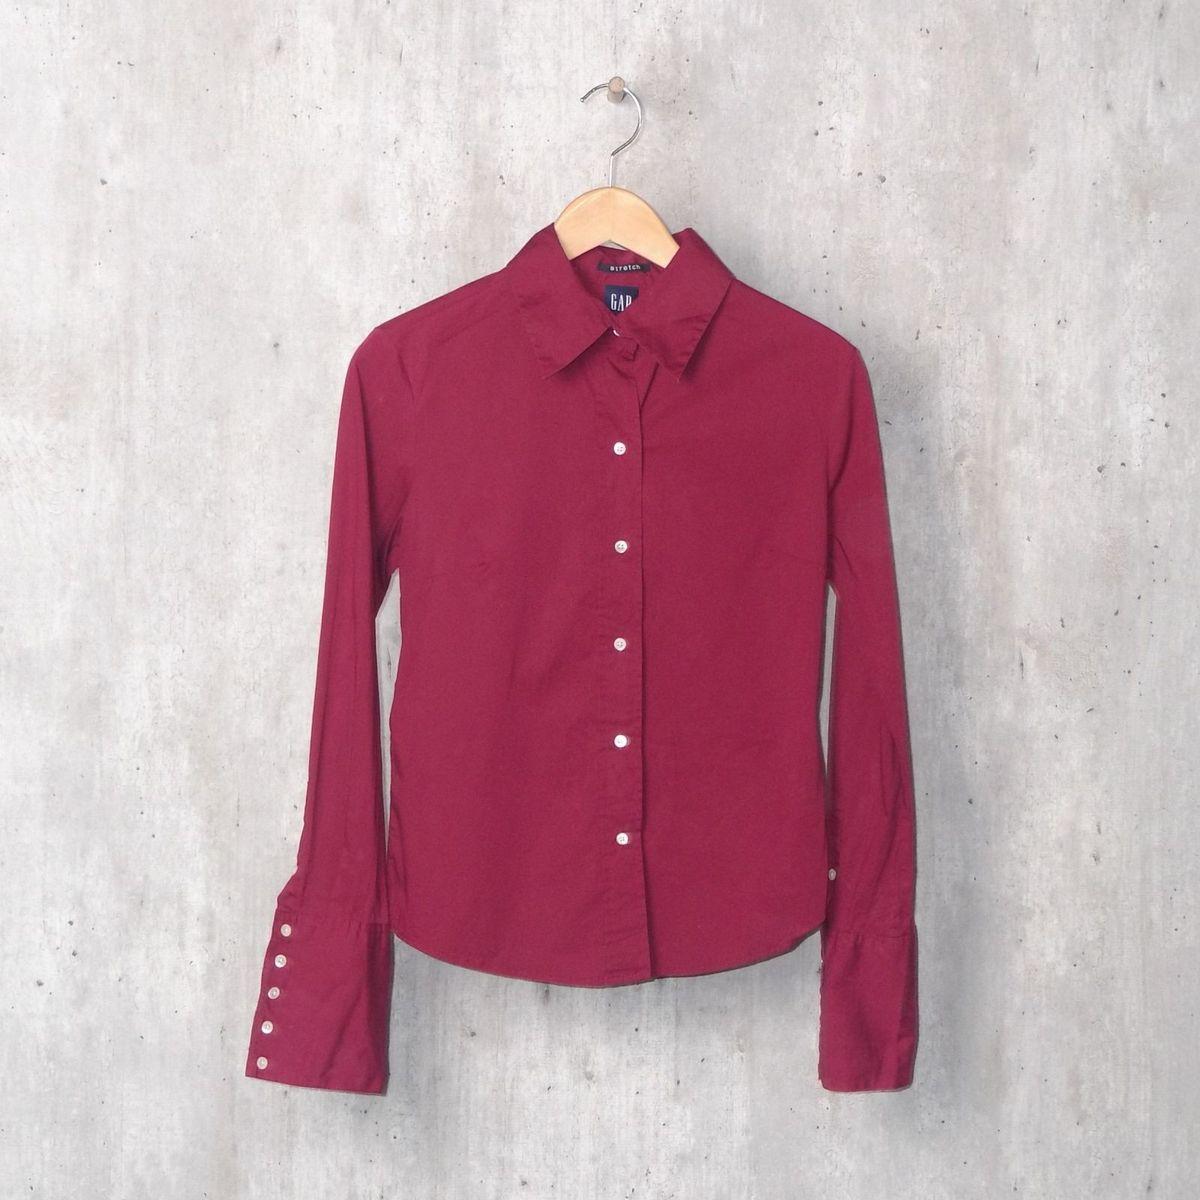 2540d0b7bf Camisa Social Marsala Conforto